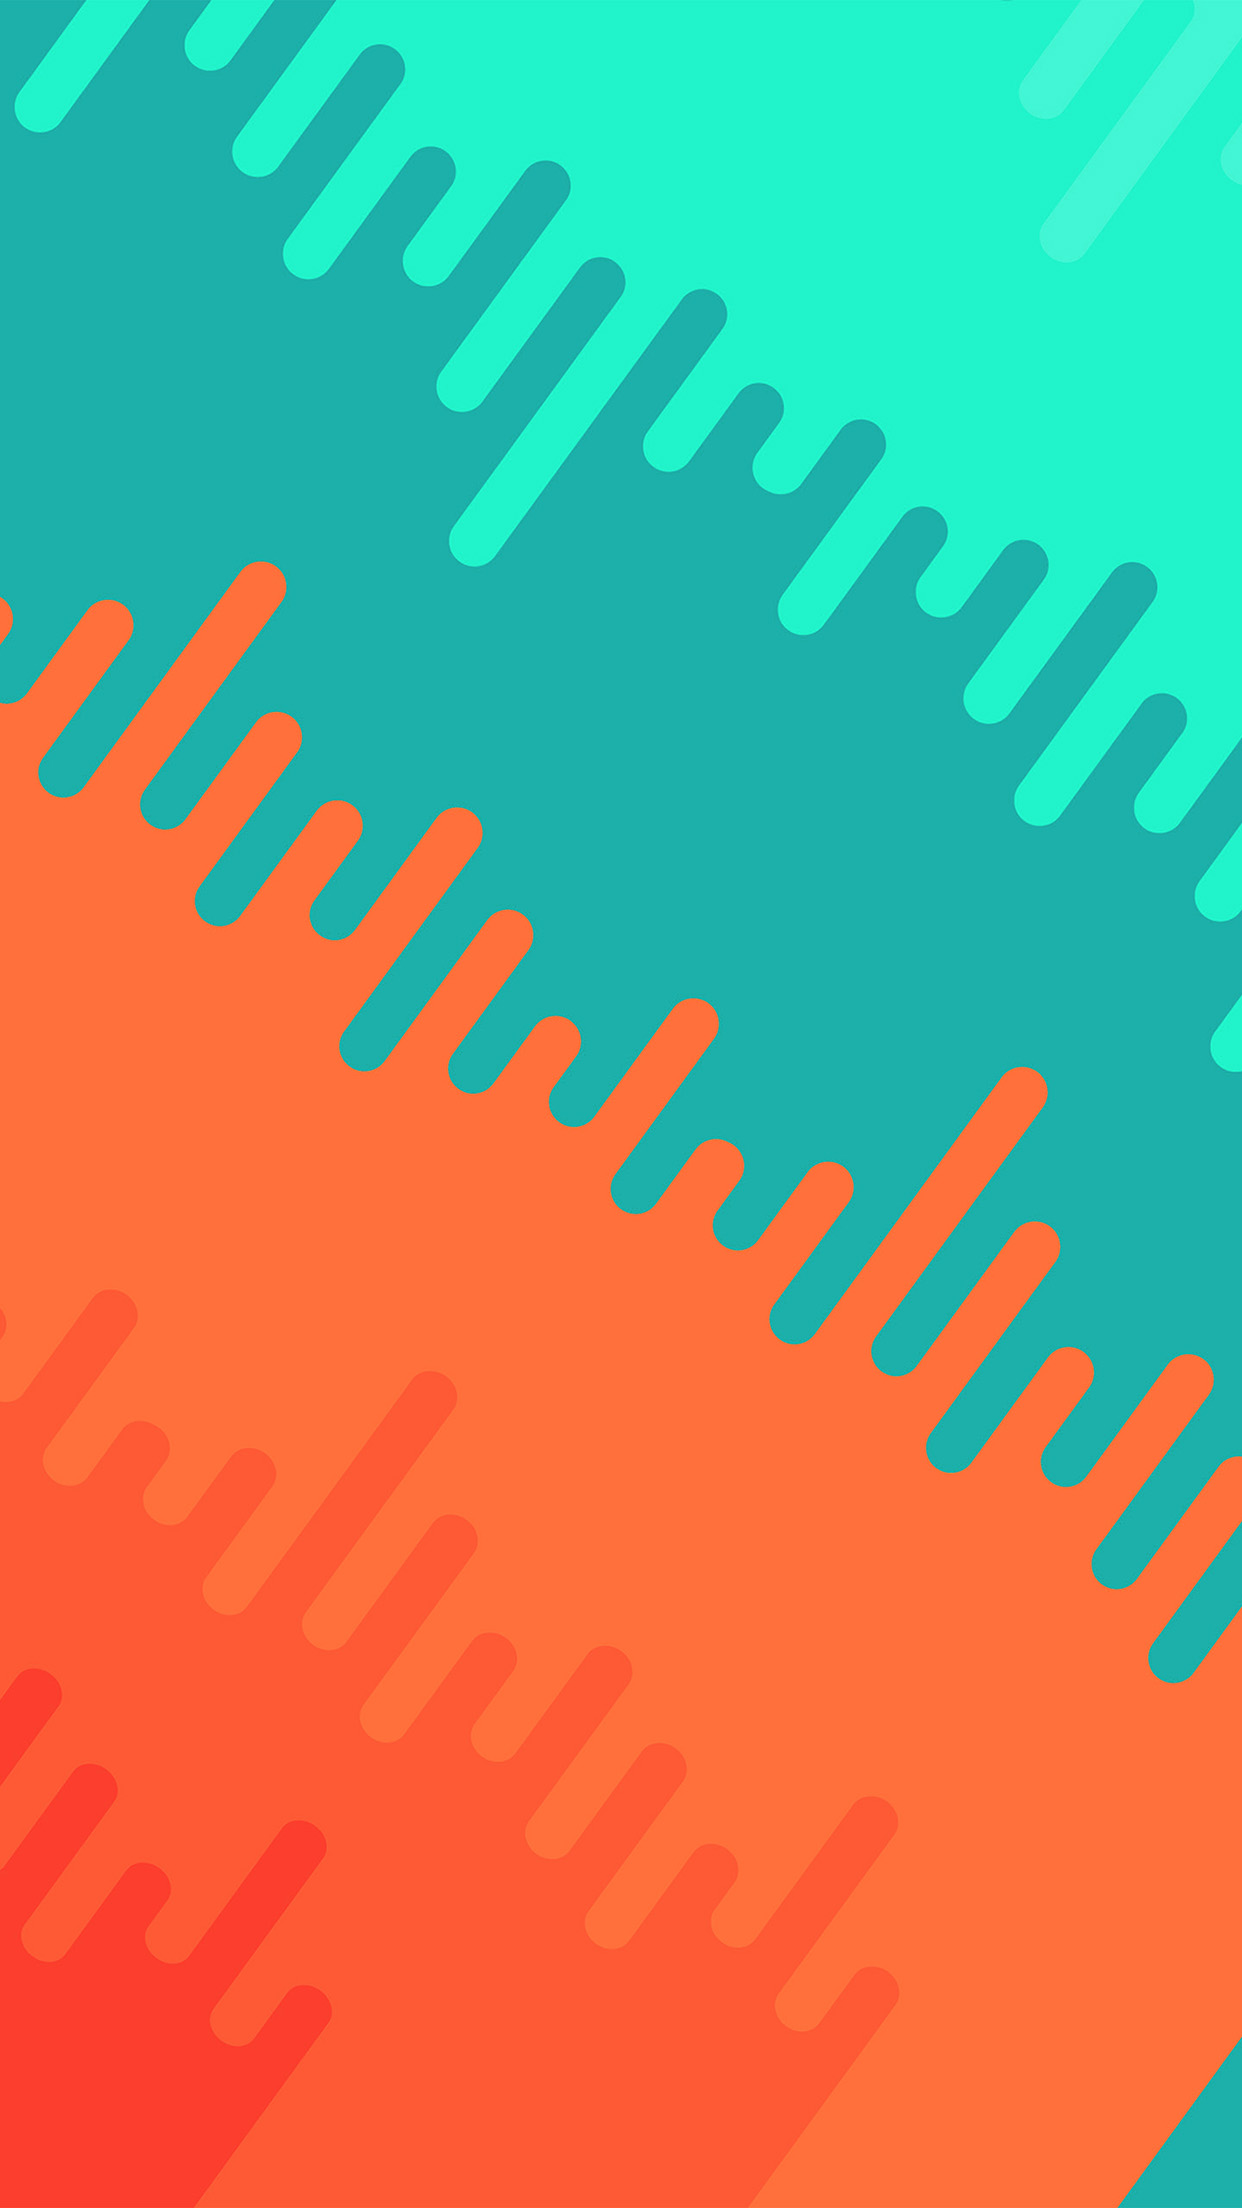 Vr04 Abstract Orange Green Art Pattern Wallpaper